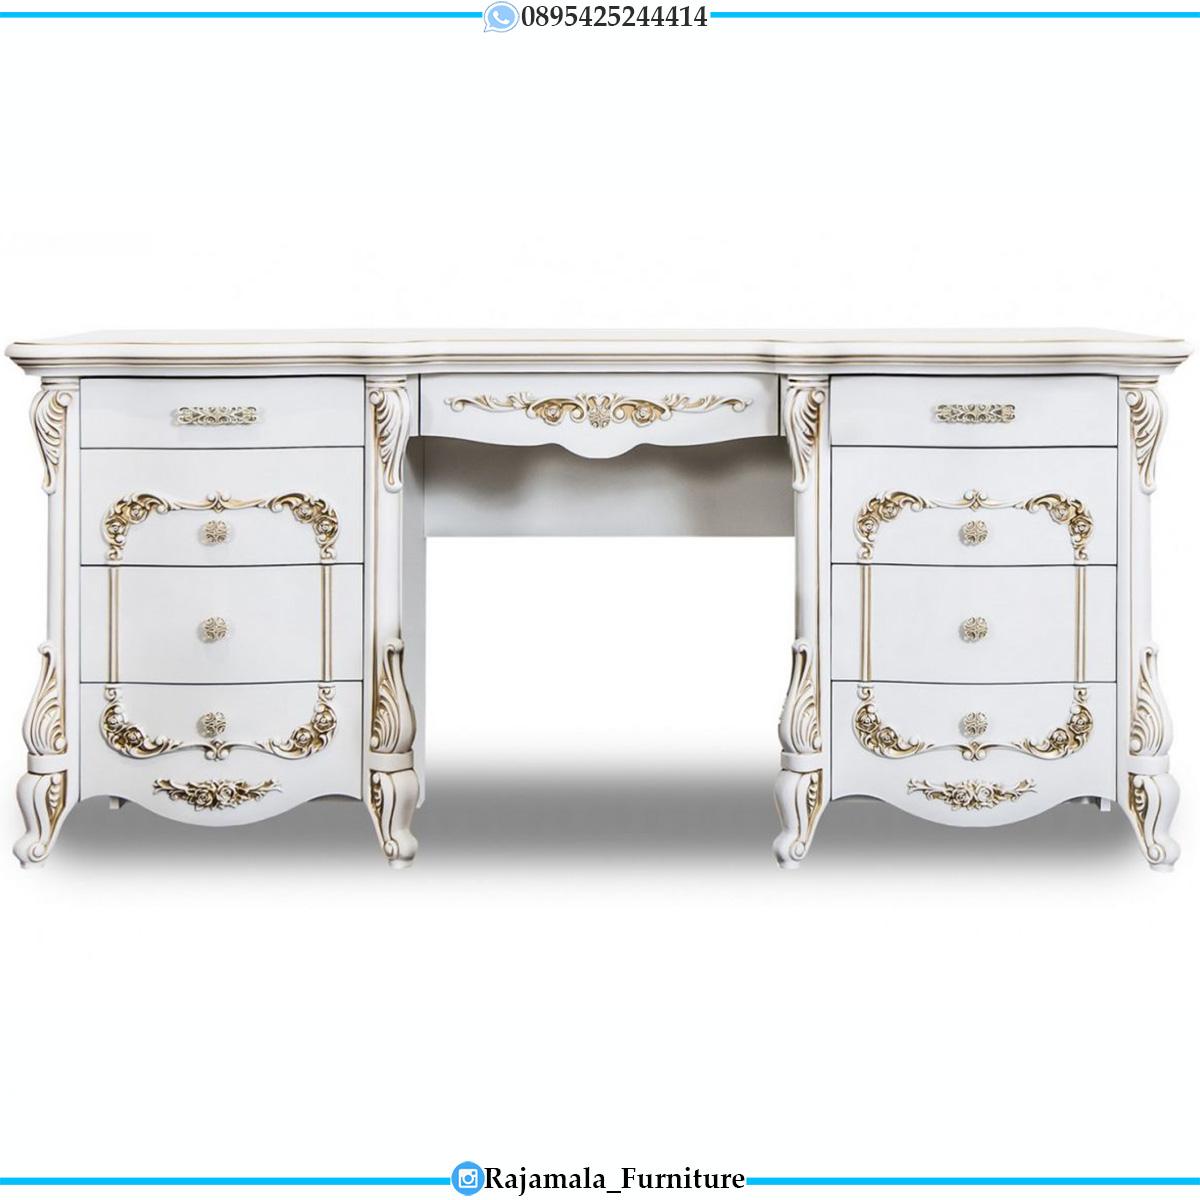 Meja Rias Mewah Putih Duco Golden Combination Luxury Carving Jepara RM-0545